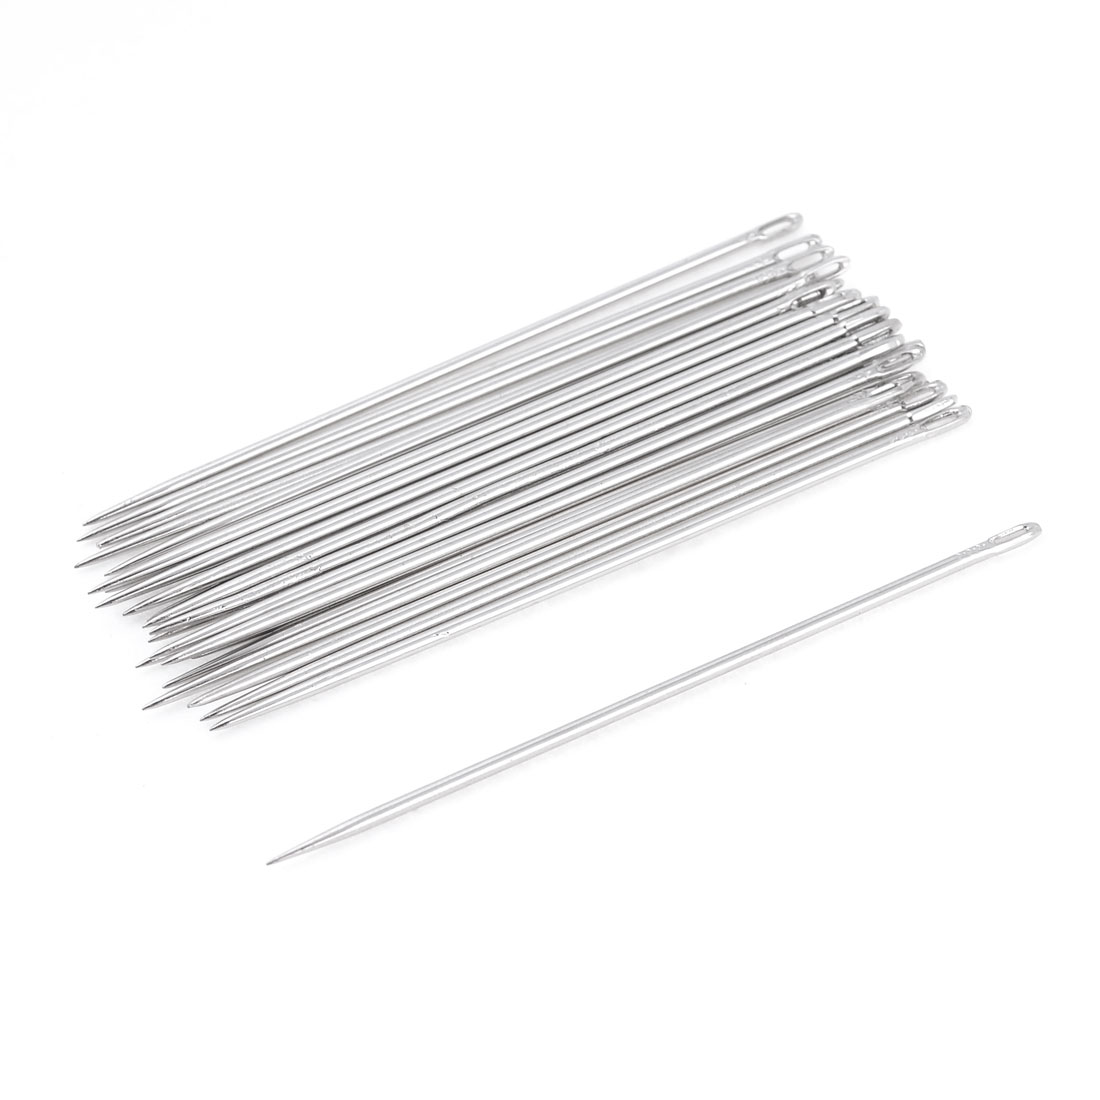 1.4mm Dia Sharp Tip Metal Tailor Sewing Needles 25 Pcs